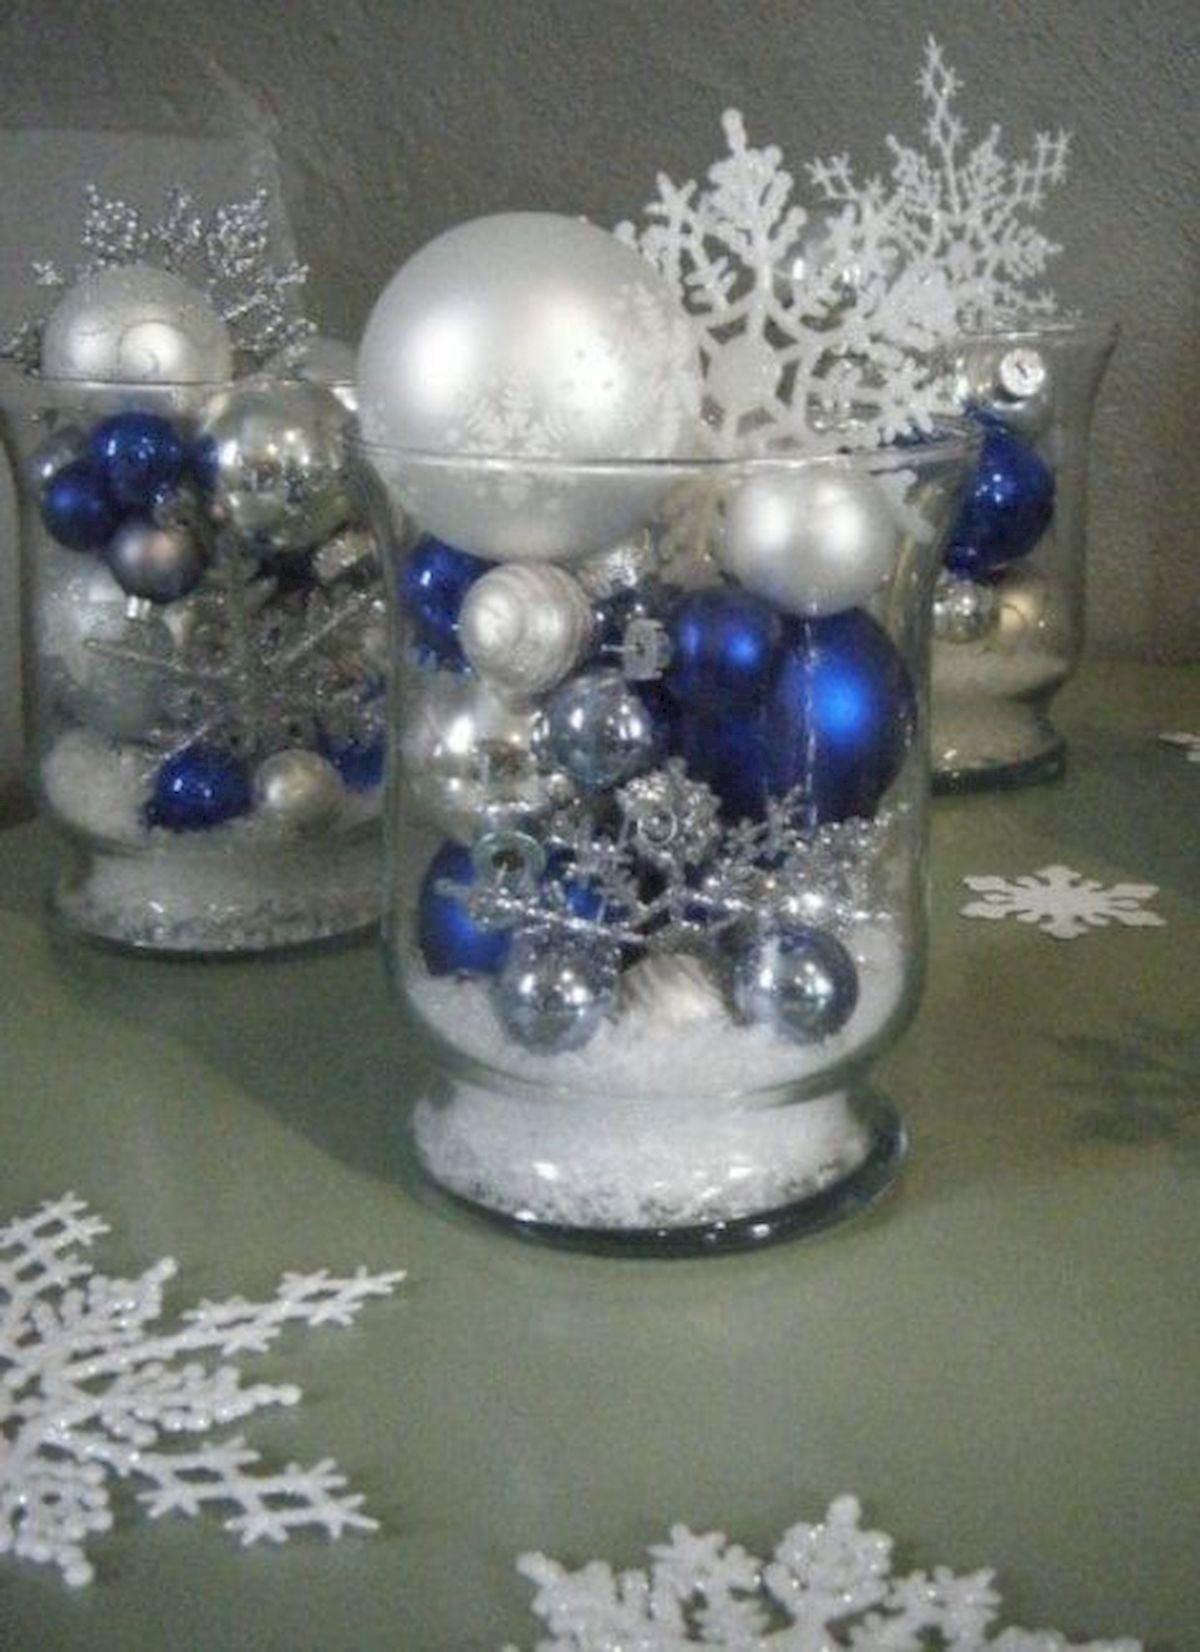 Diy Decorating Ideas For Christmas Winter Wonderland Centerpieces Winter Wonderland Decorations Christmas Centerpieces